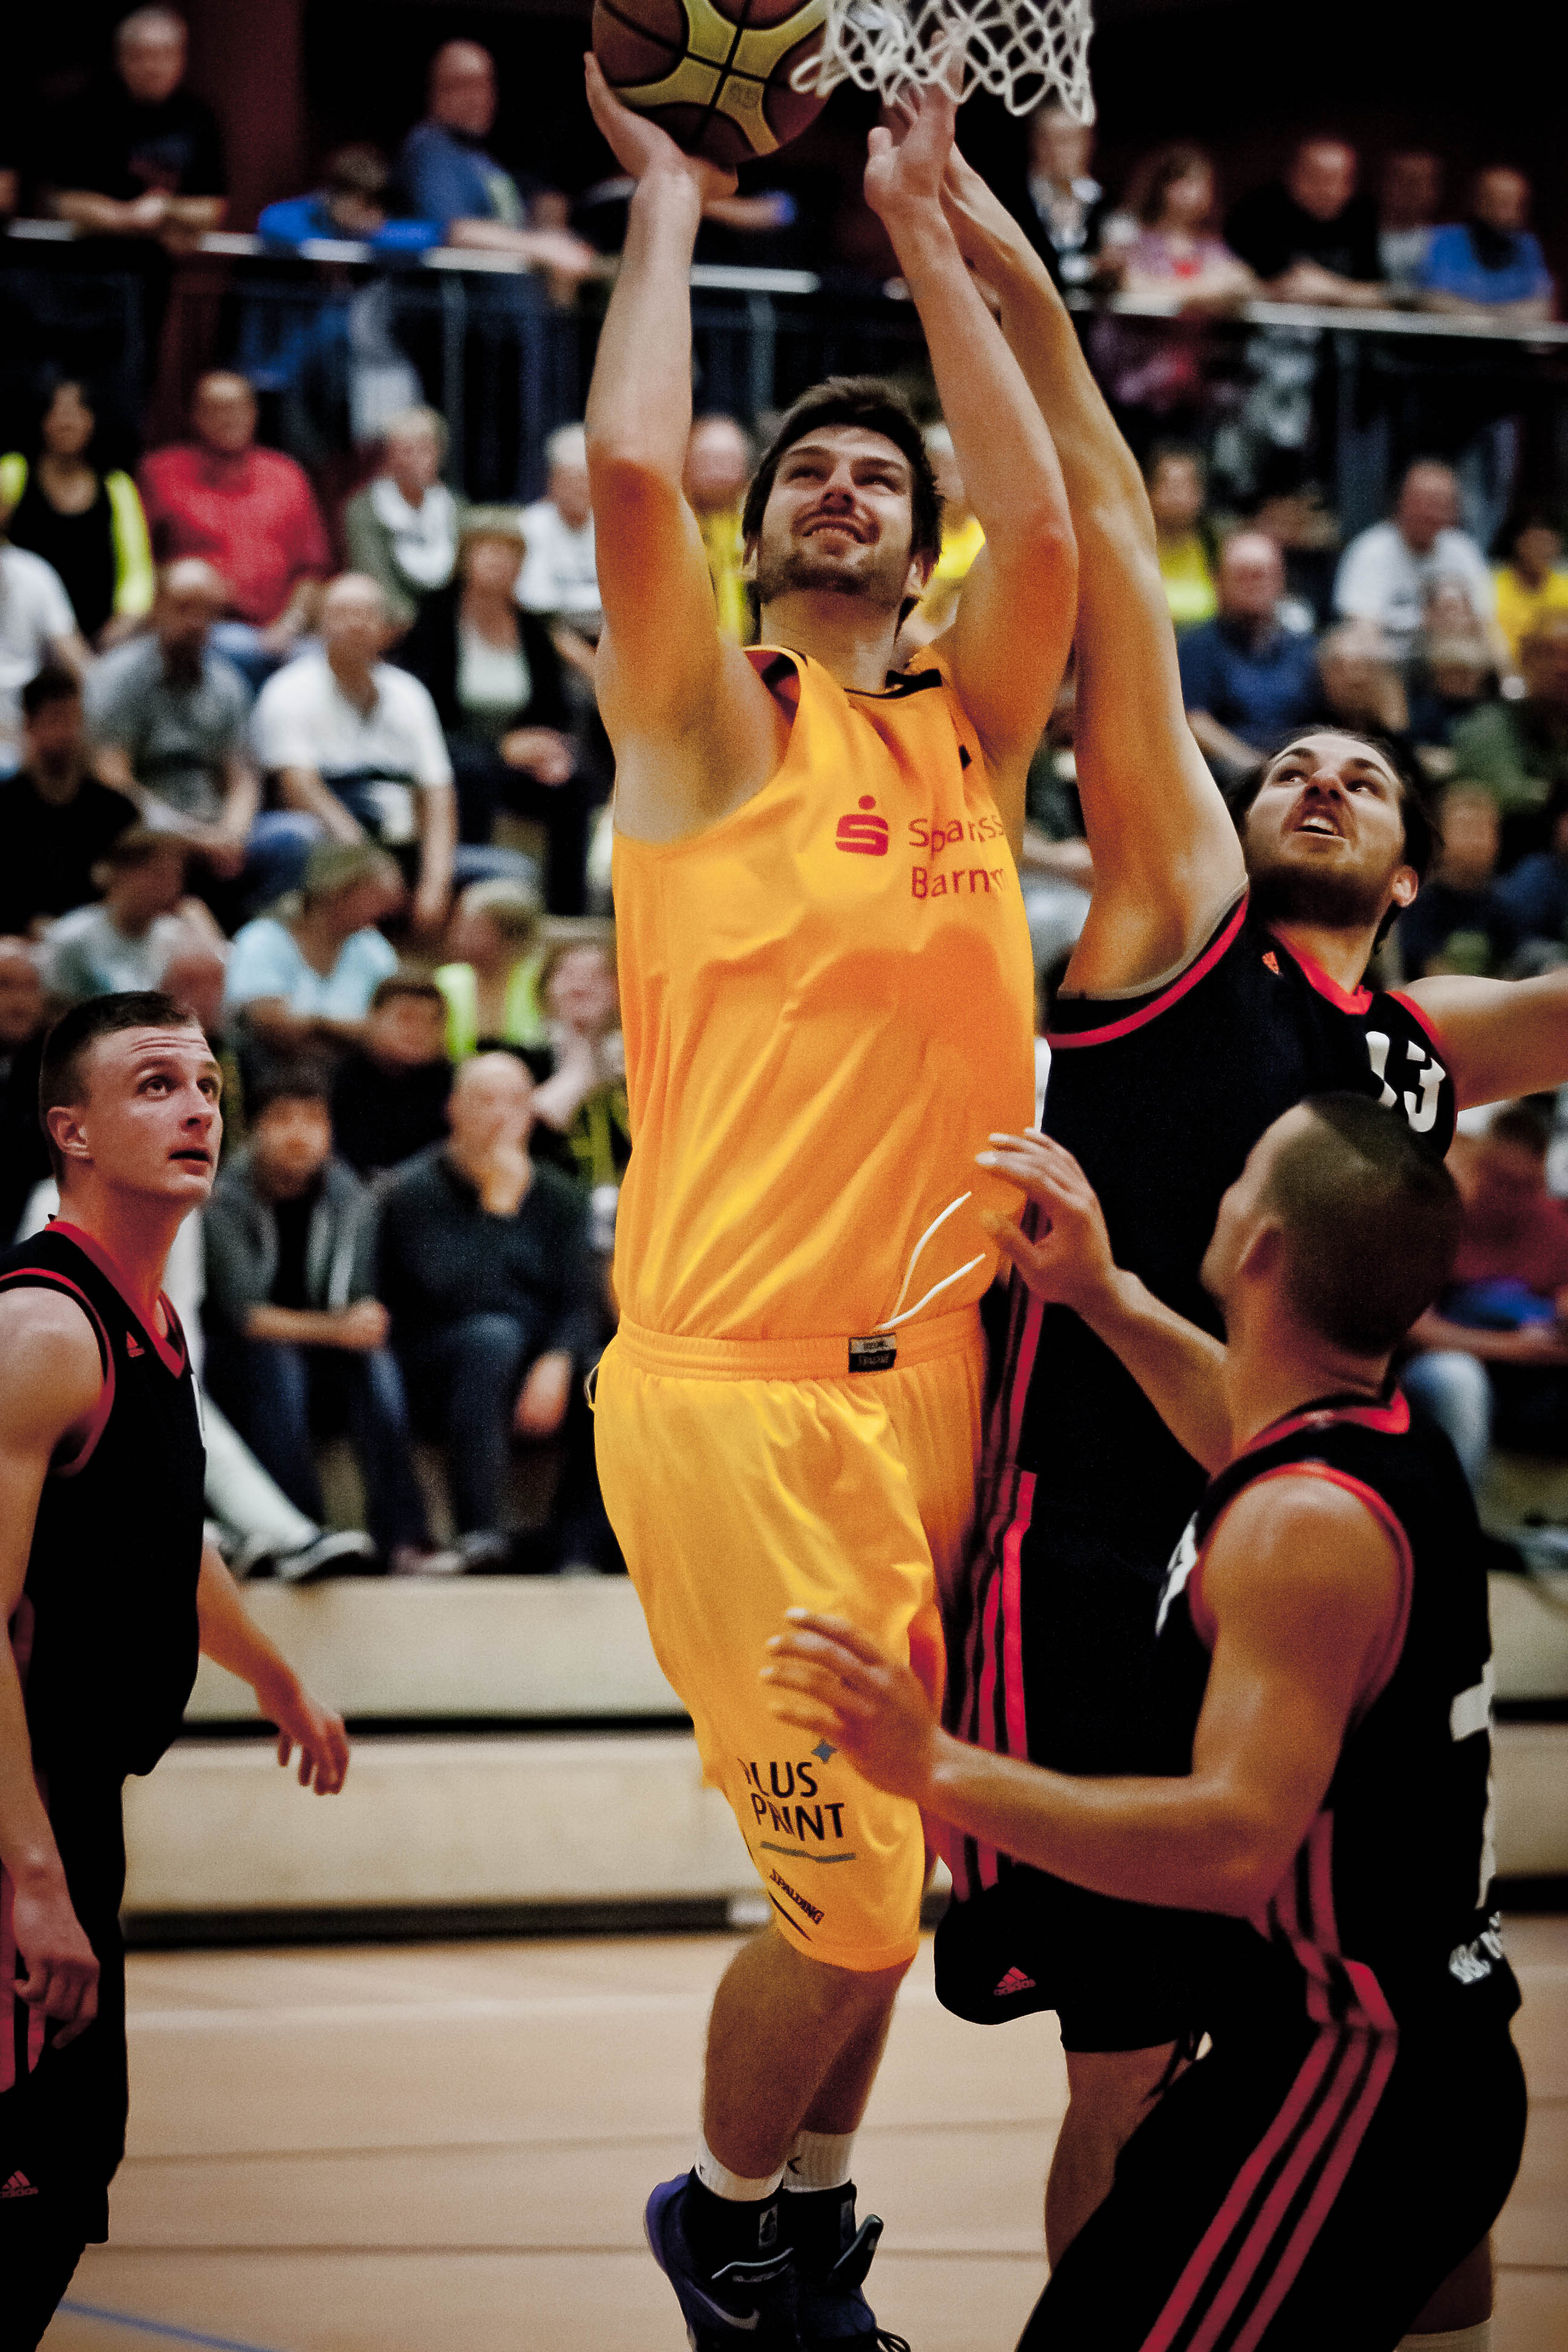 Basketball Lok Bernau dreht Spitzenspiel gegen Cuxhaven